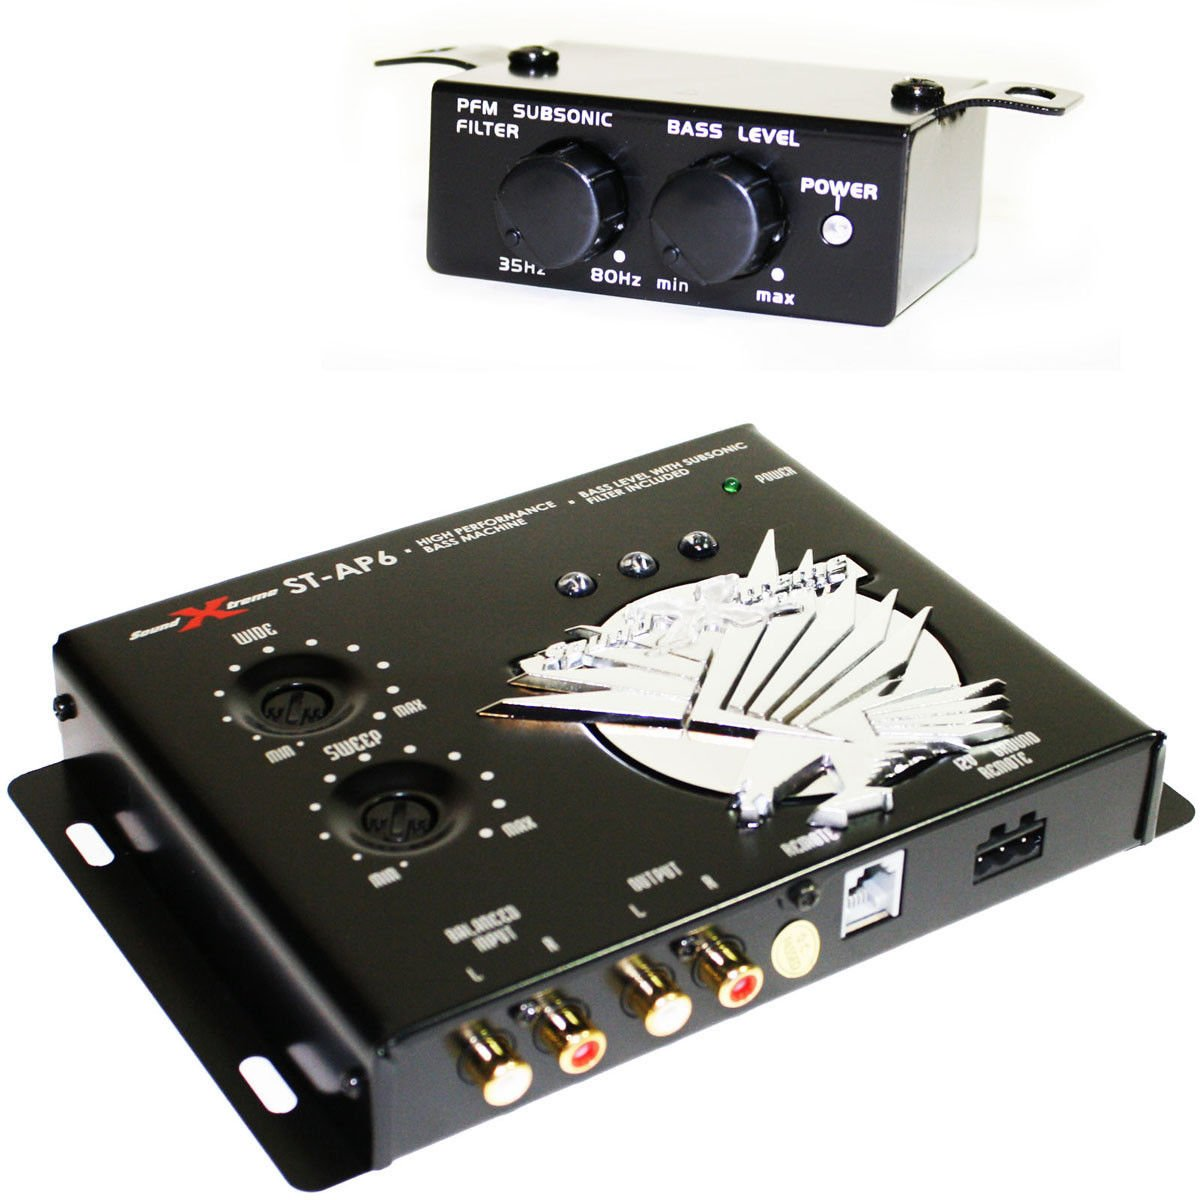 SoundXtreme BASS MACHINE EPICENTER SUBWOOFER EQUALIZATION SUB EQ ST-AP6 RP BX-12